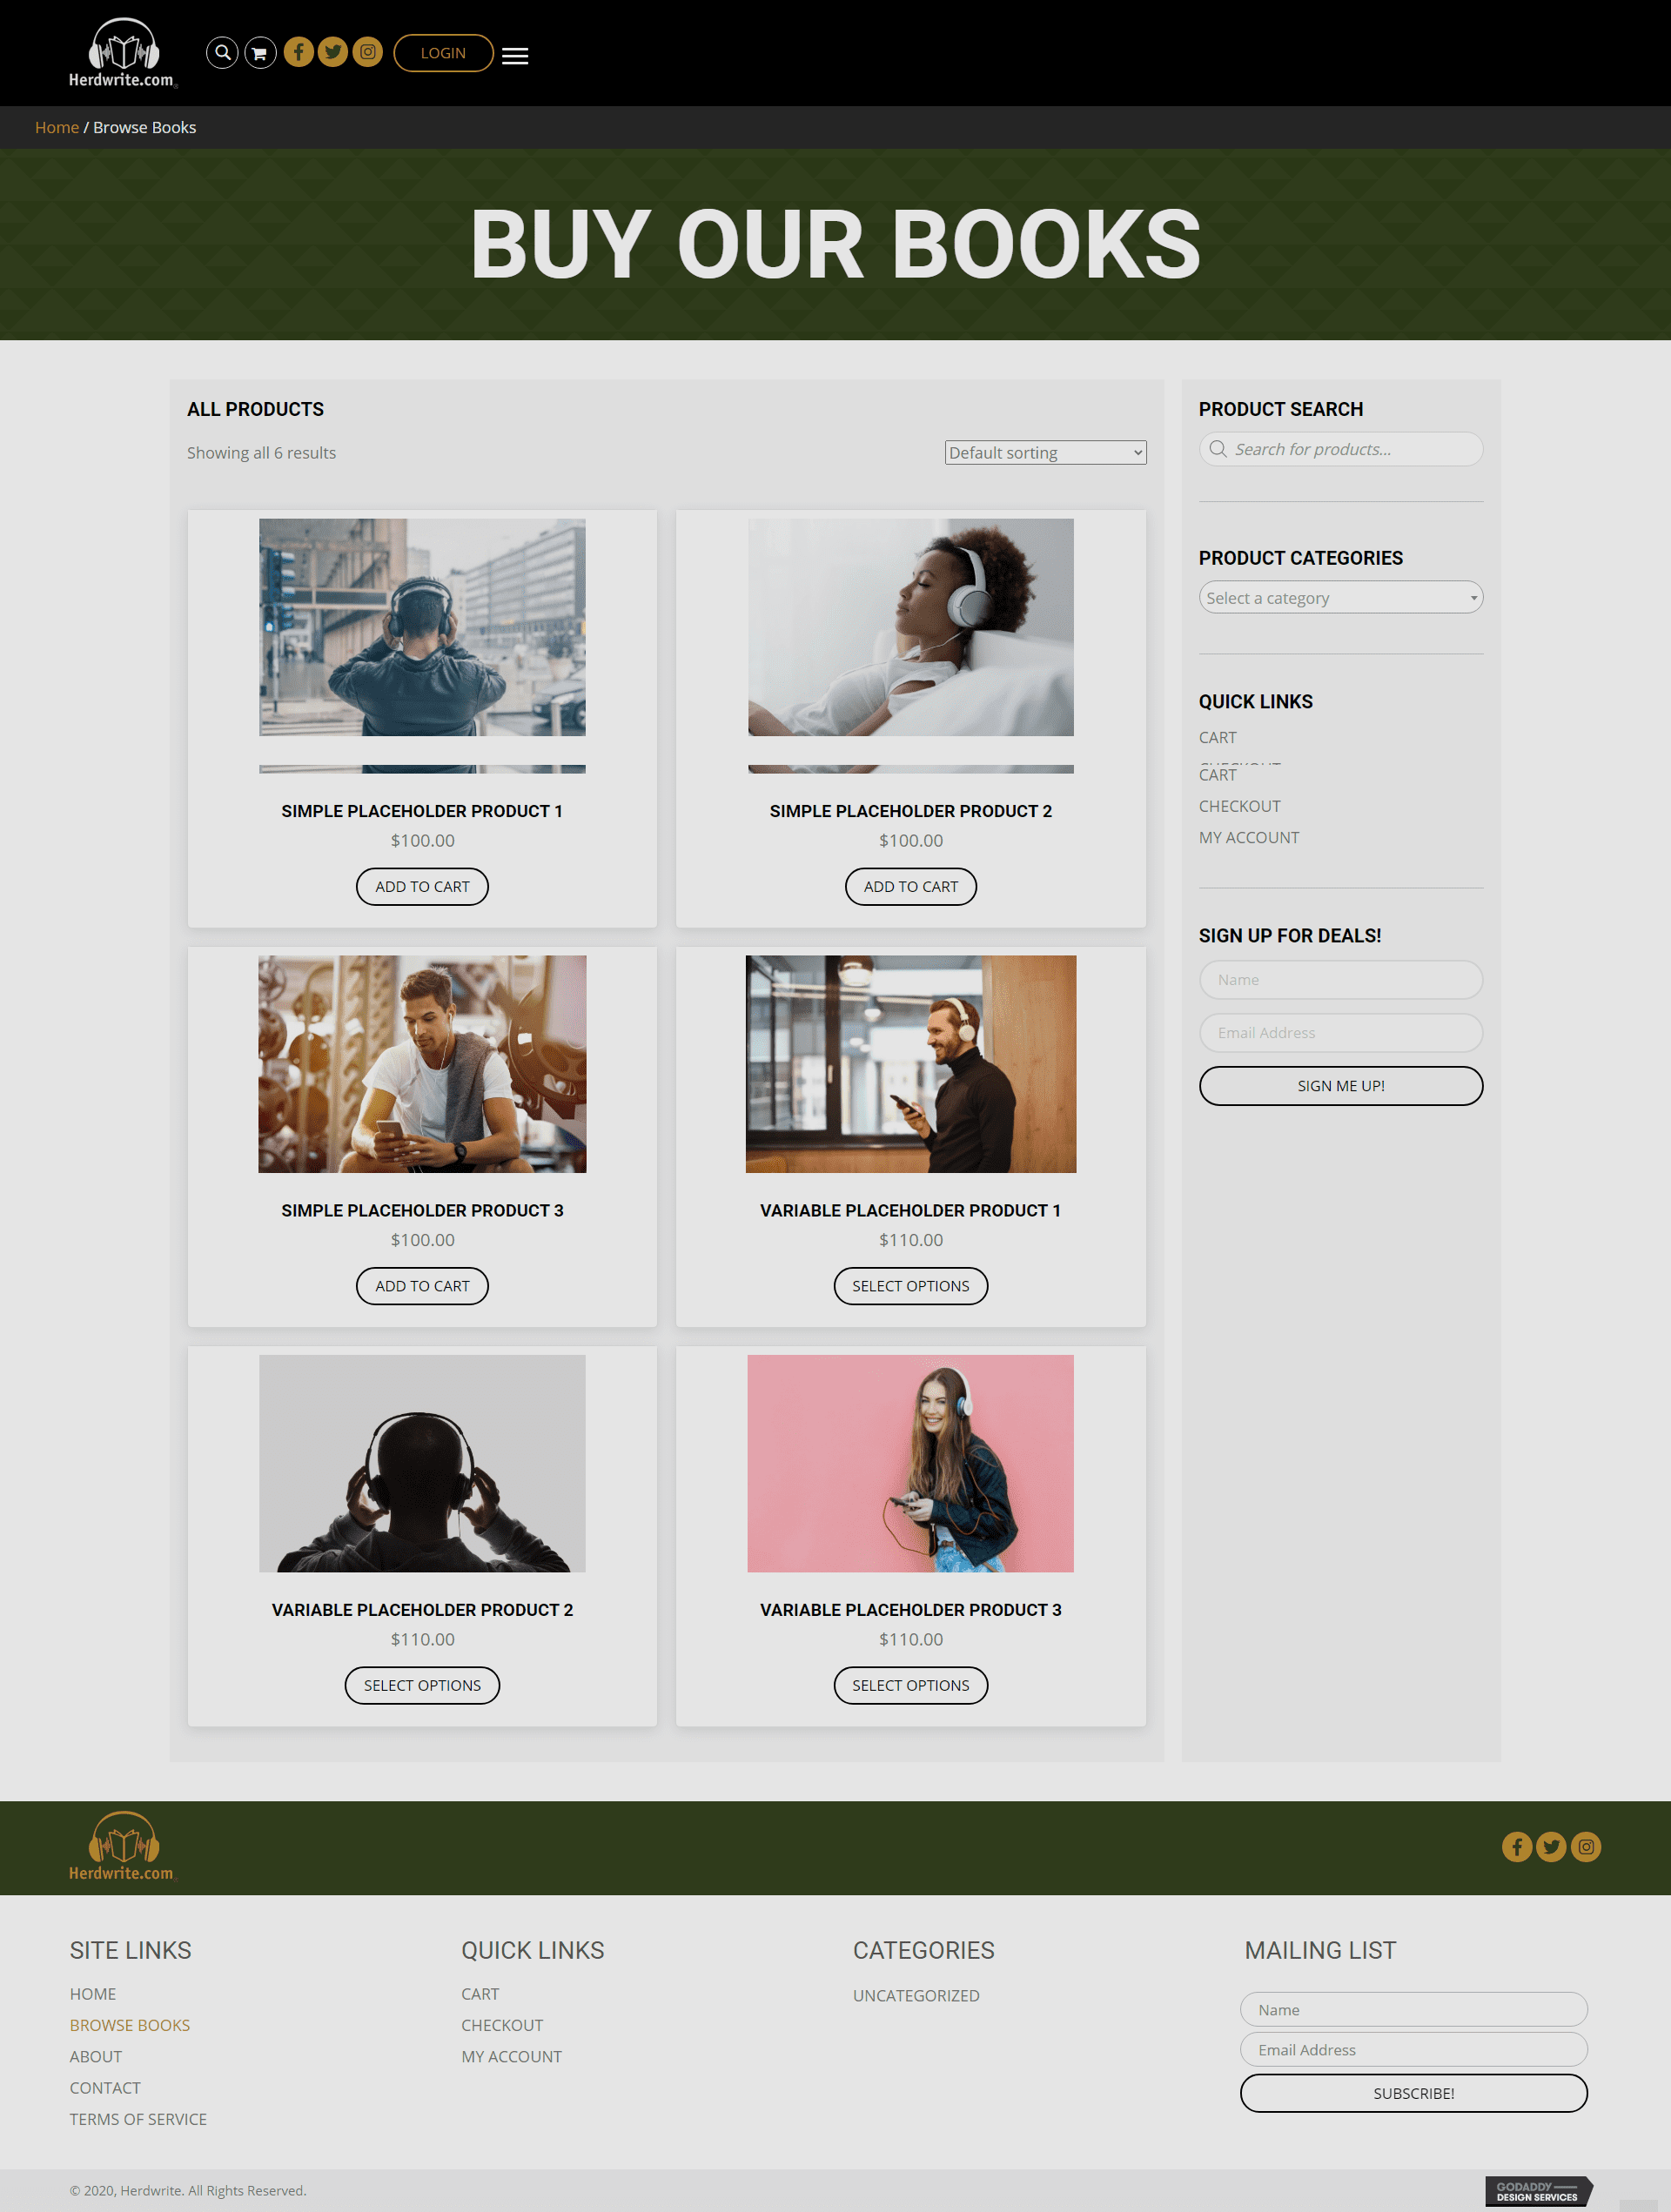 Herdwrite Shop Page